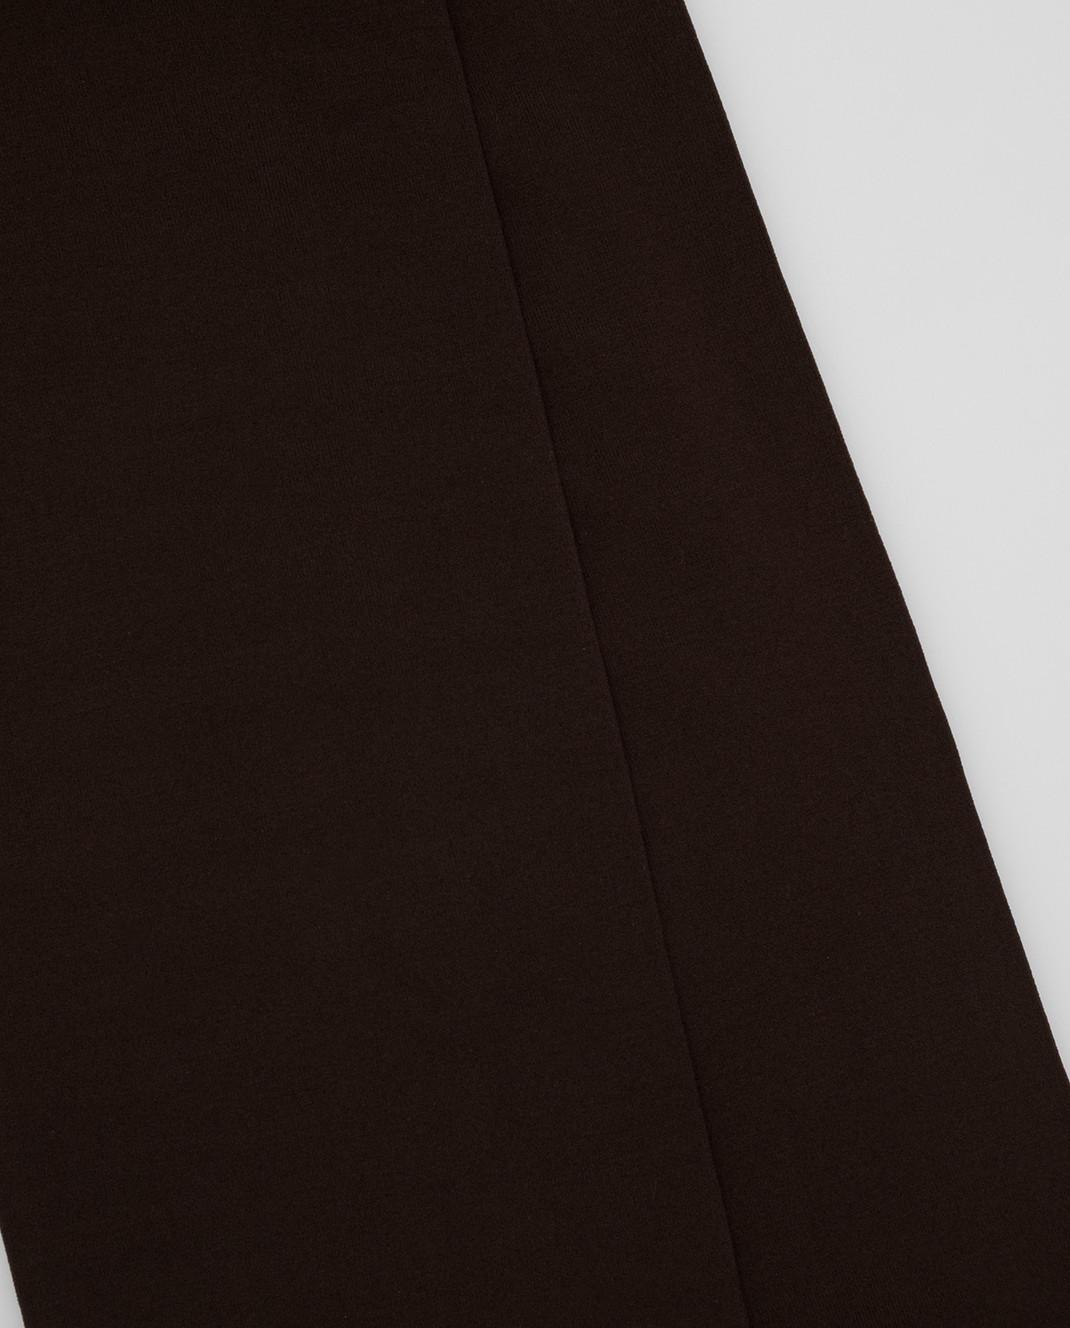 Max Mara Темно-коричневые колготы 50 ден изображение 3